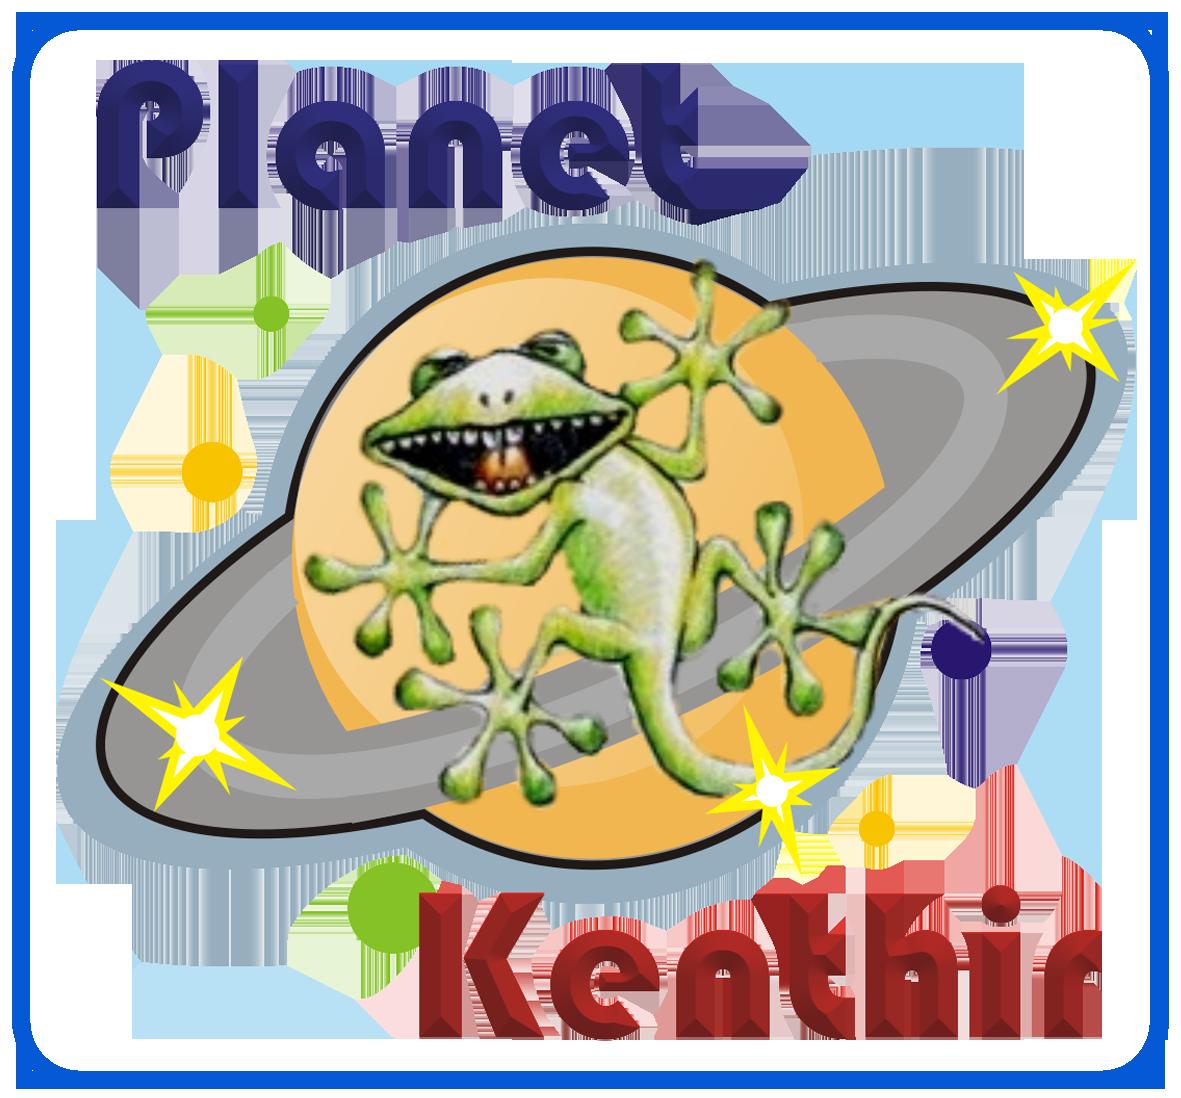 items/kaleidoskop_2020/planet-kenthir-hires-1607754236.png